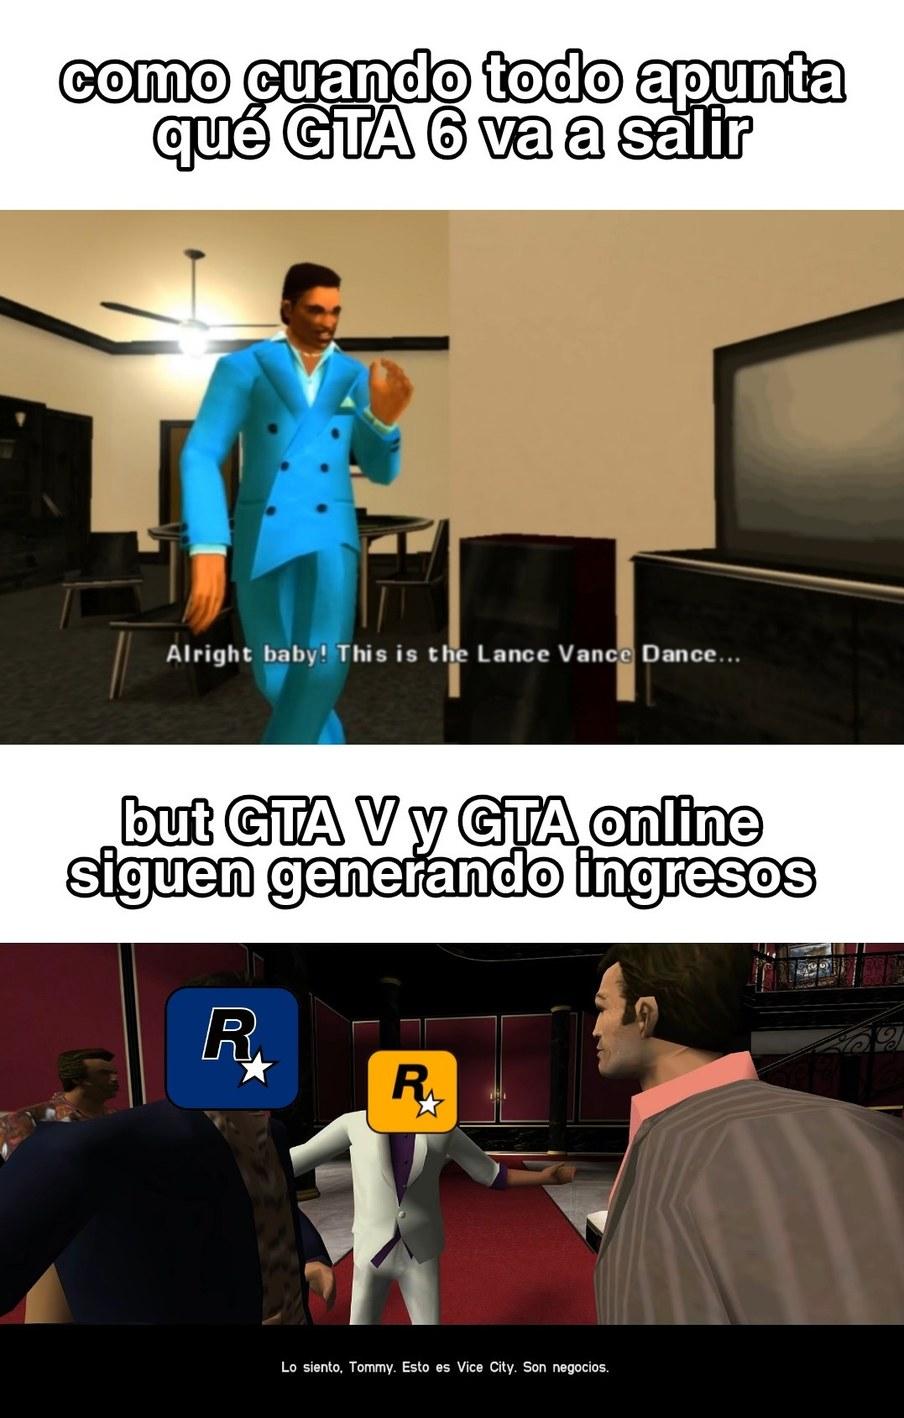 Rockstar qliado ya saque el GTA 6 - meme